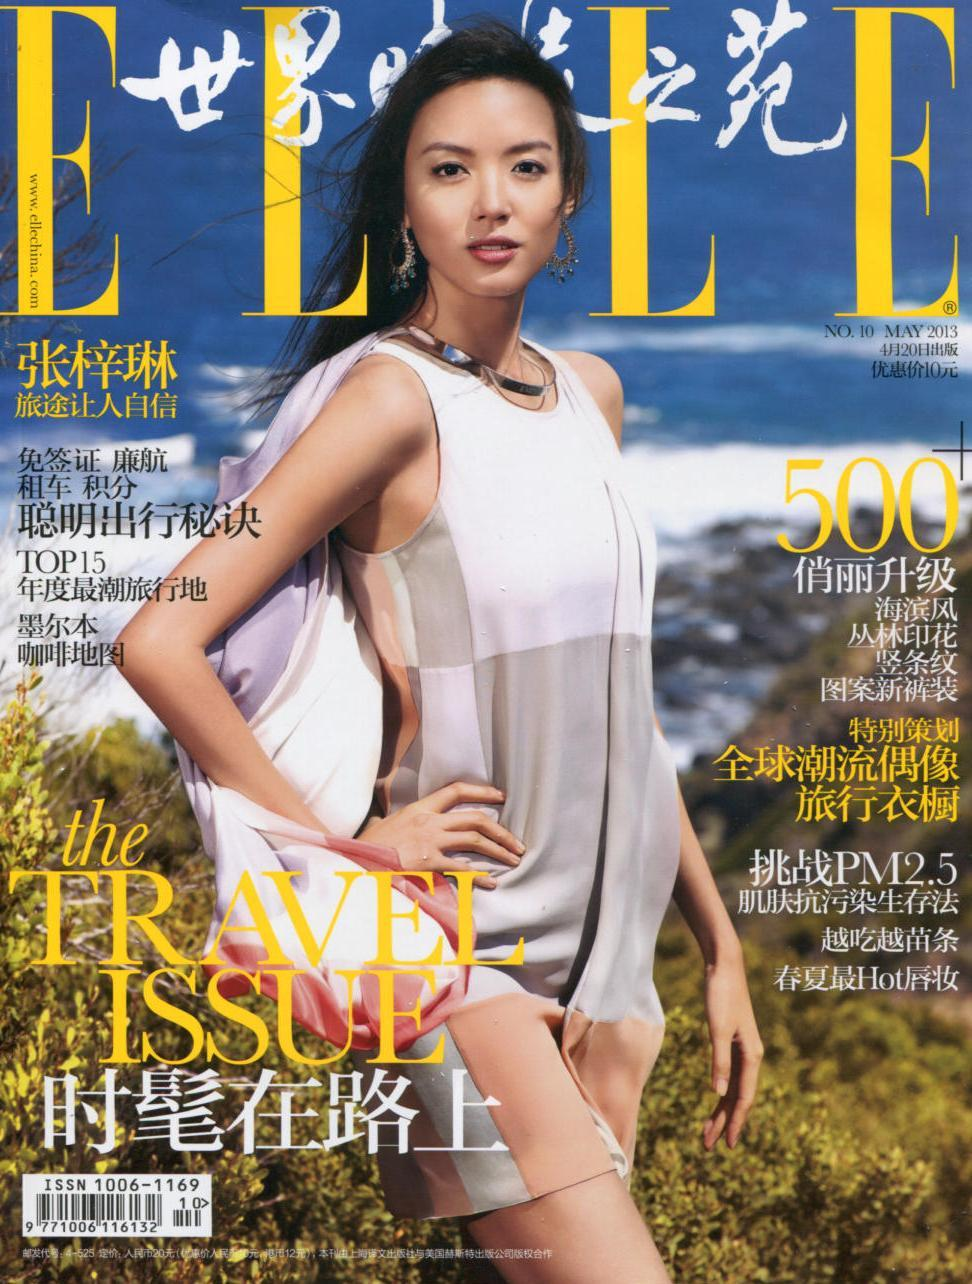 Elle CHI 2013-5-16 Cover